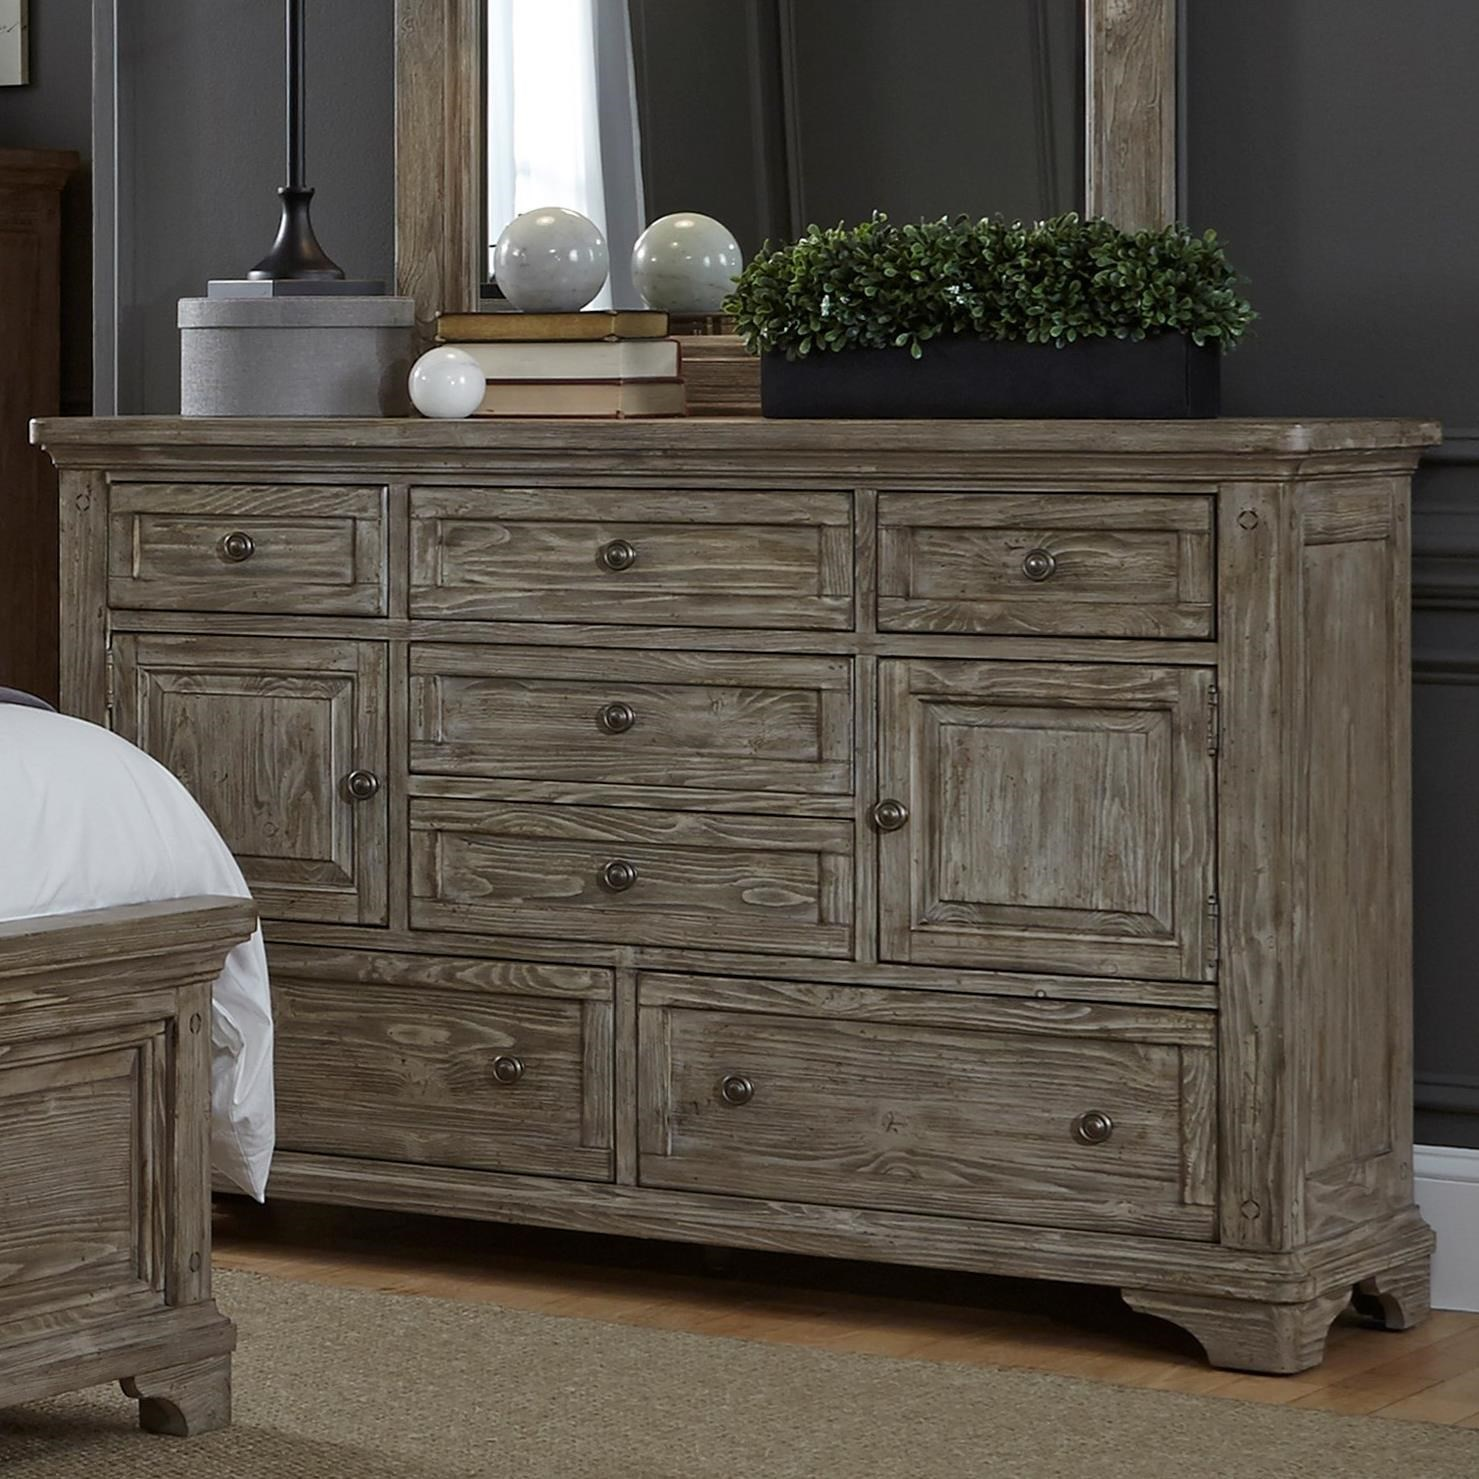 Ordinaire Liberty Furniture Highlands7 Drawer Dresser ...